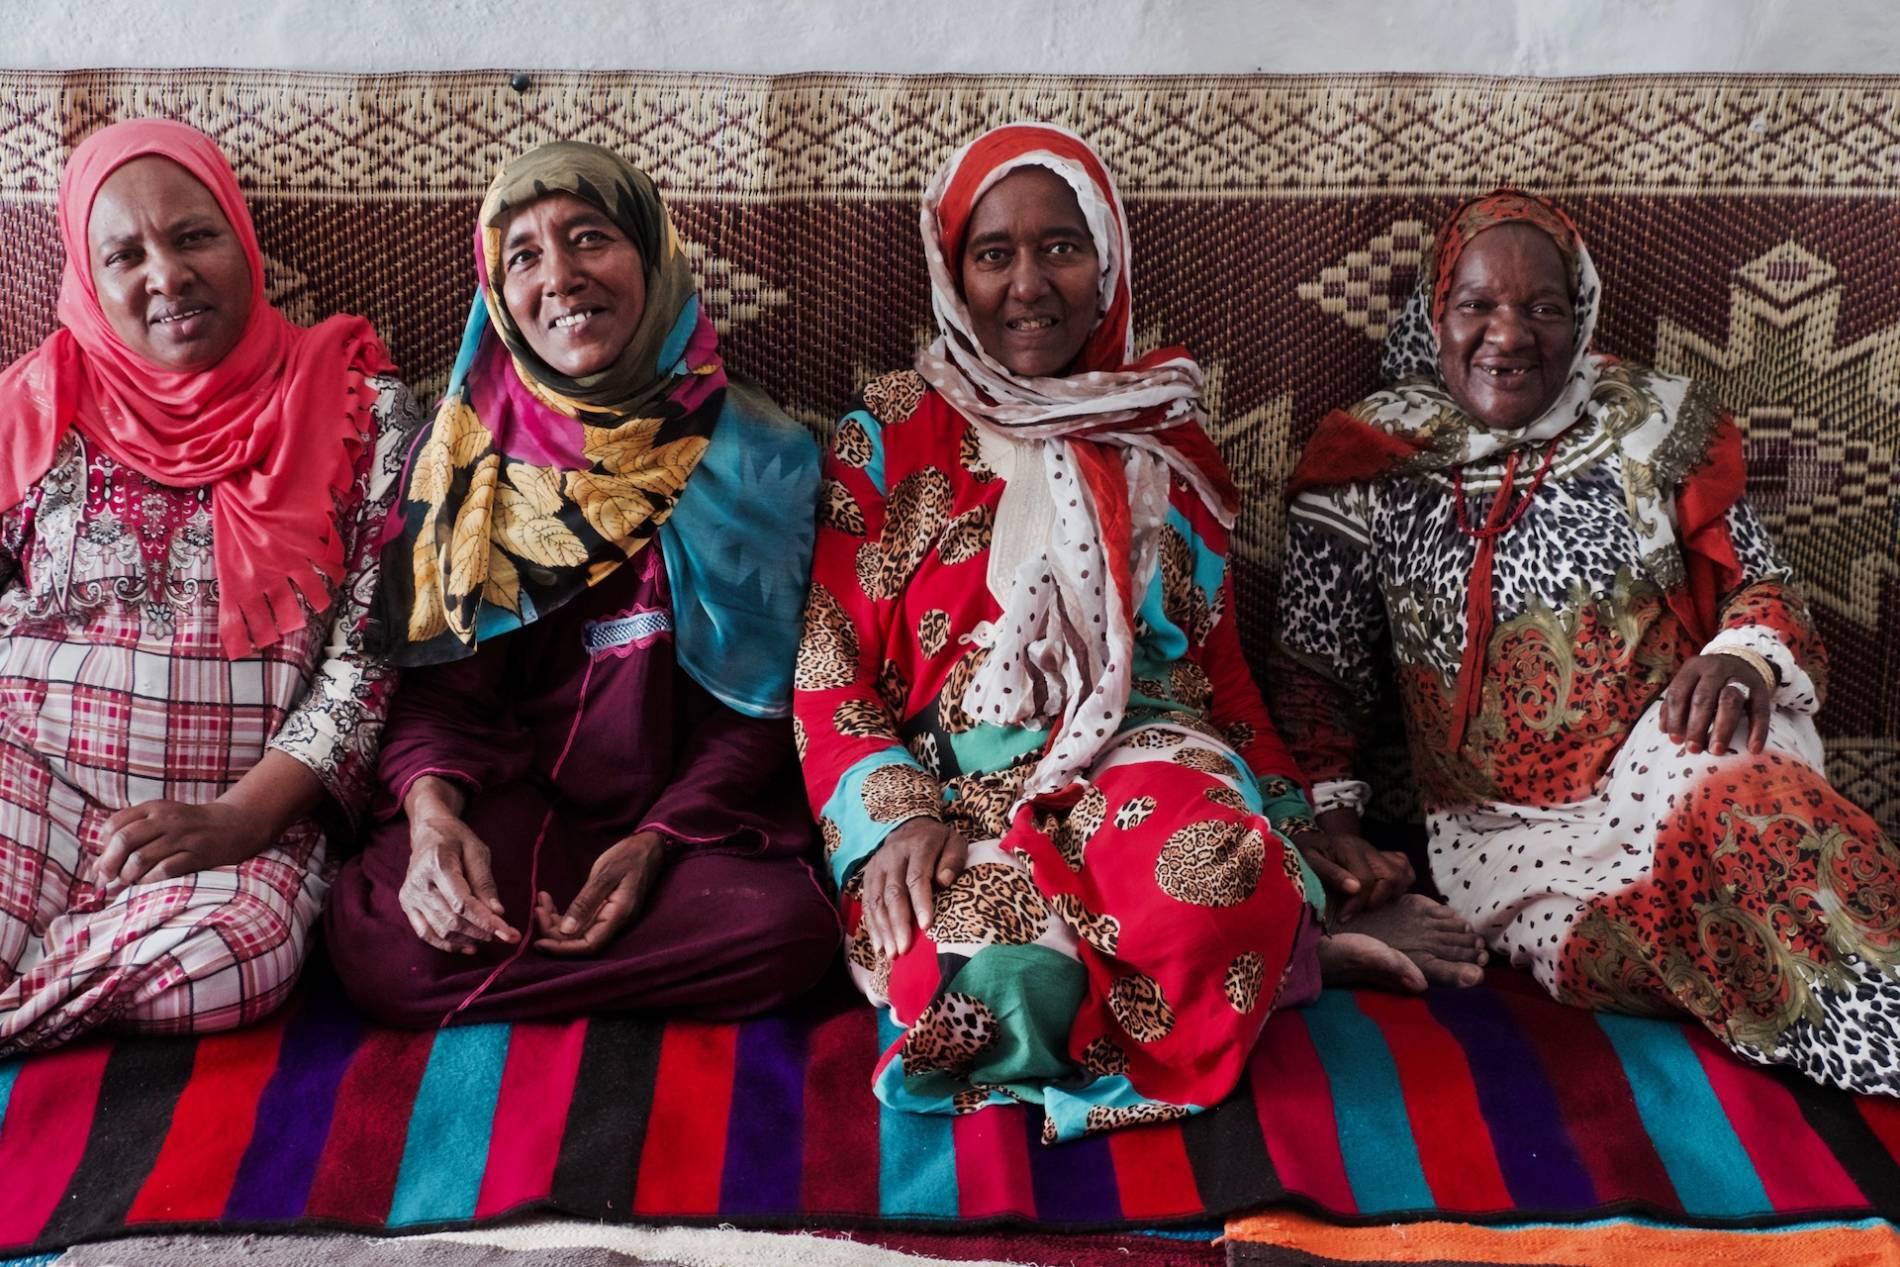 Pcpp rencontre femme divorcée tunisie